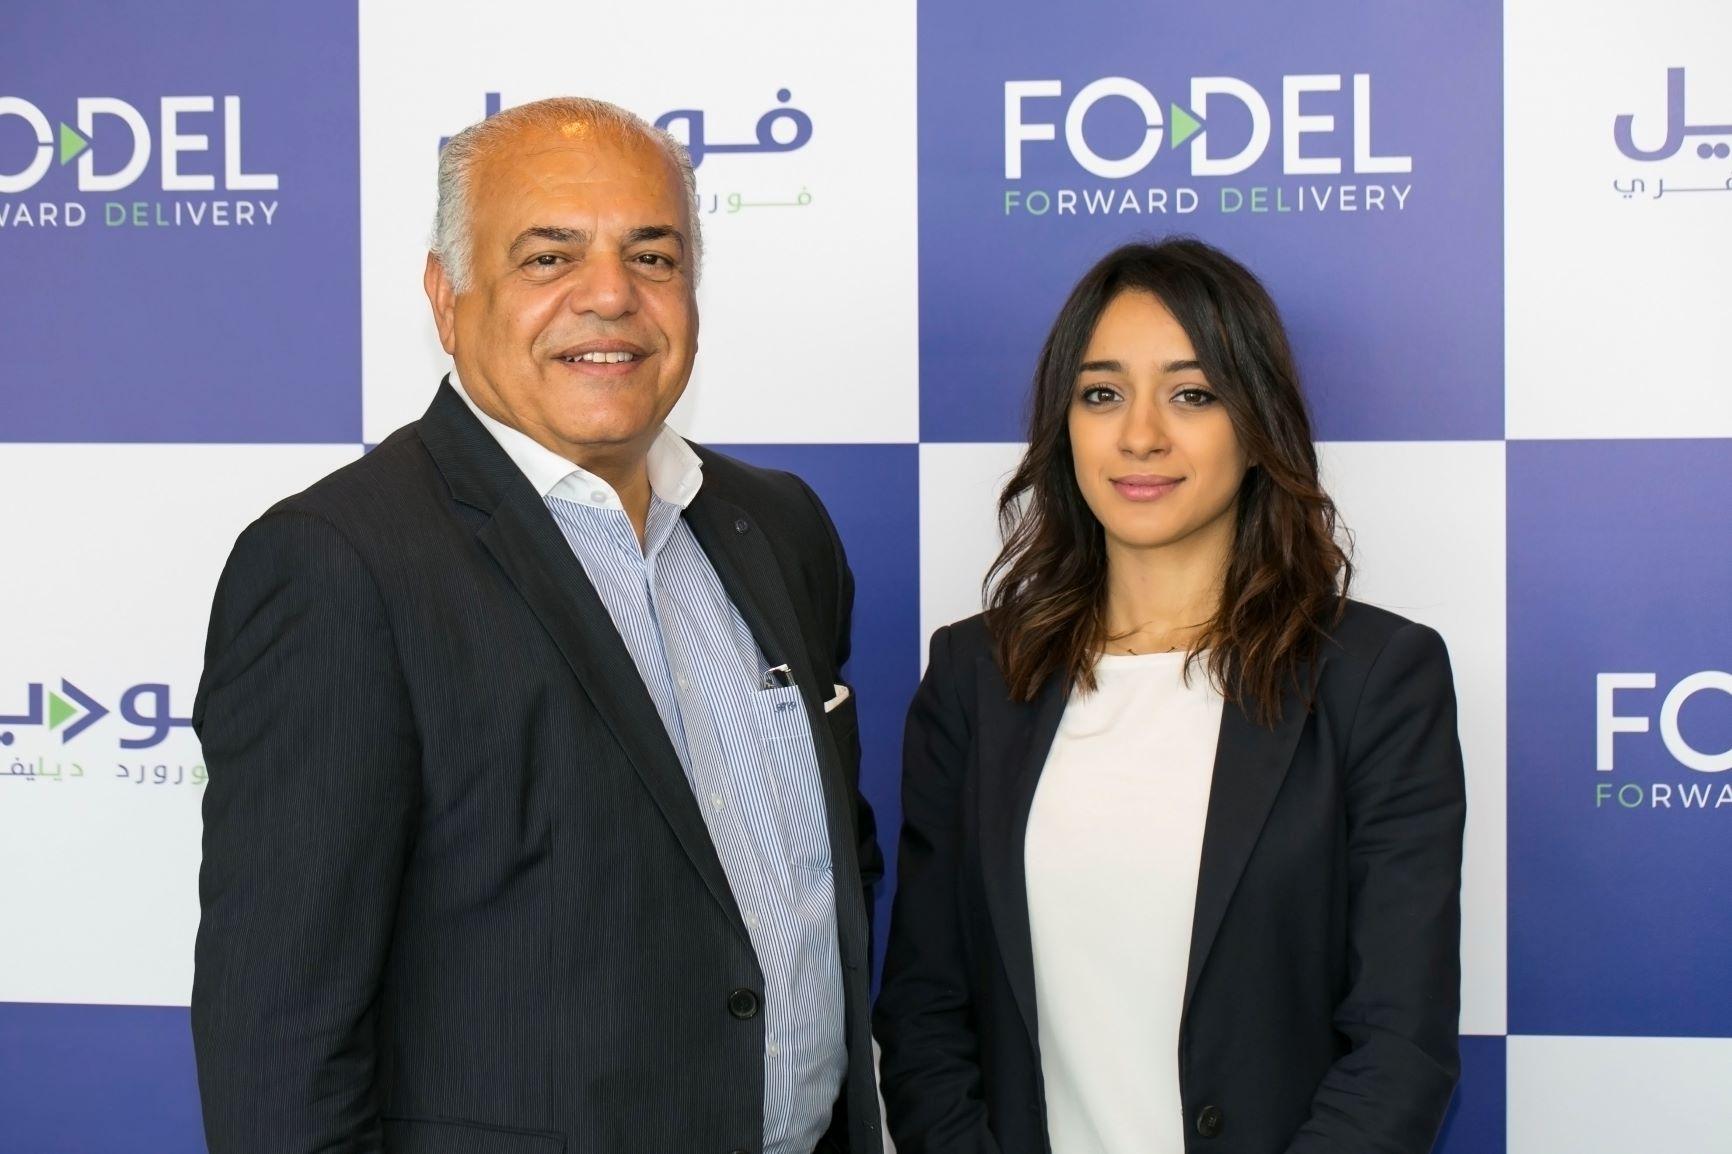 Fodel raises $2.6 million in pre-Series A